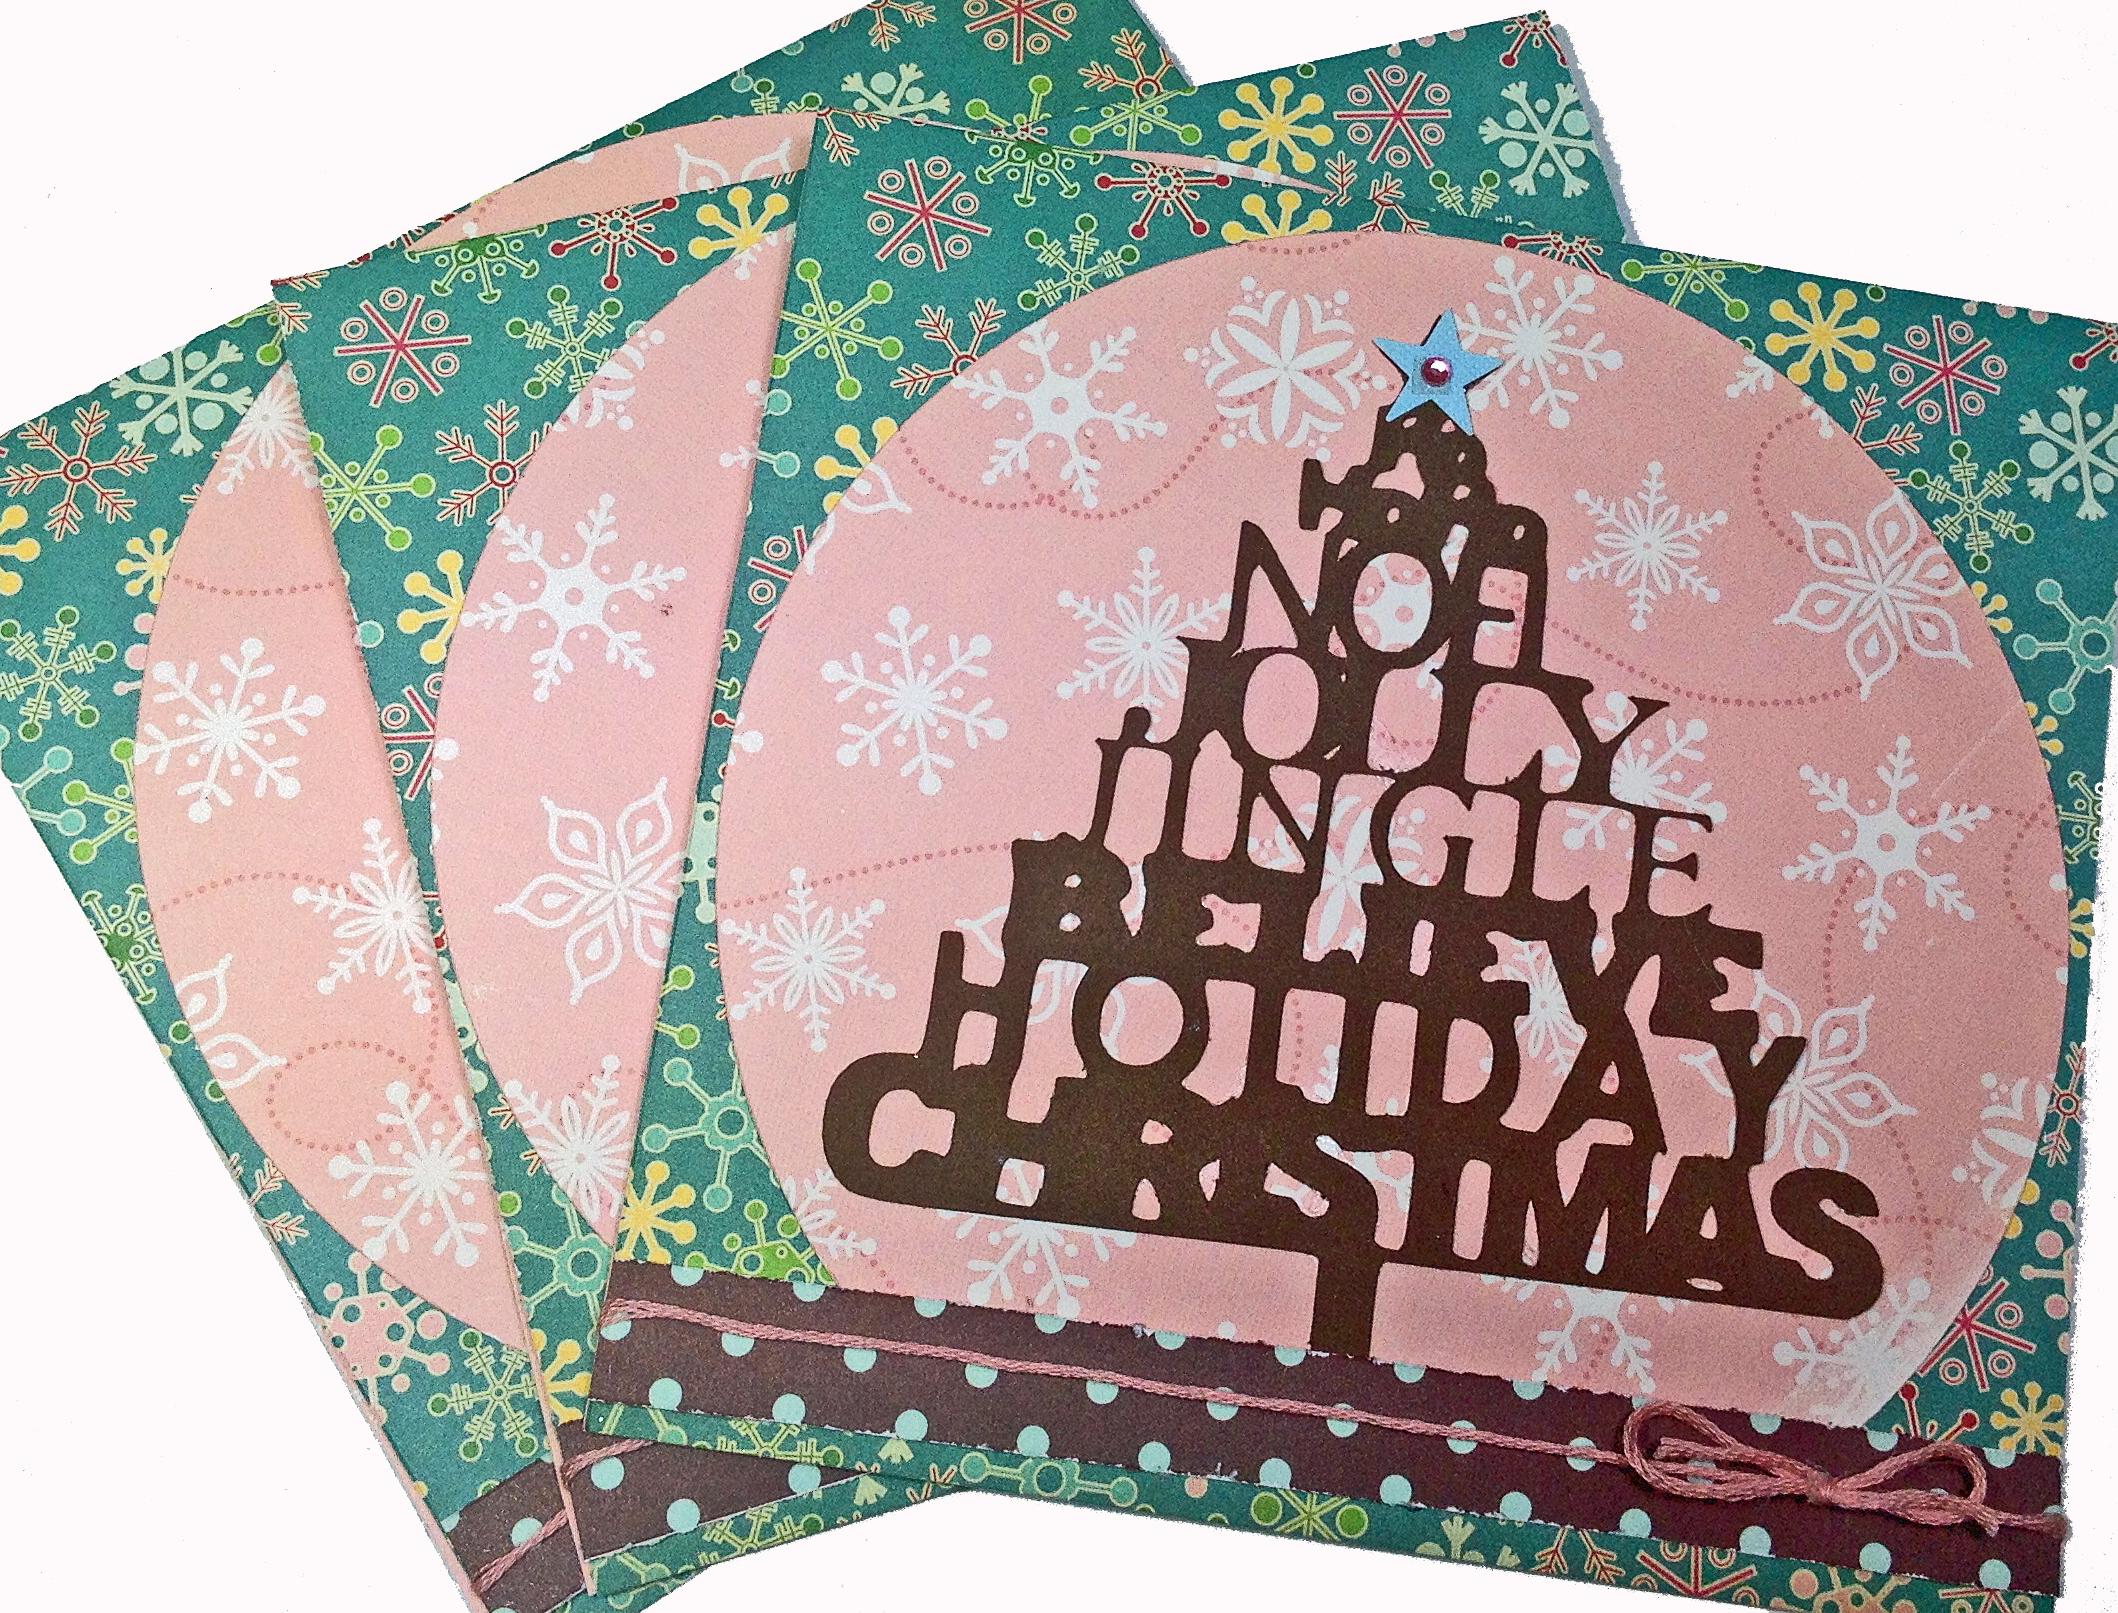 Bella Stitchery Christmas Card Giveaway